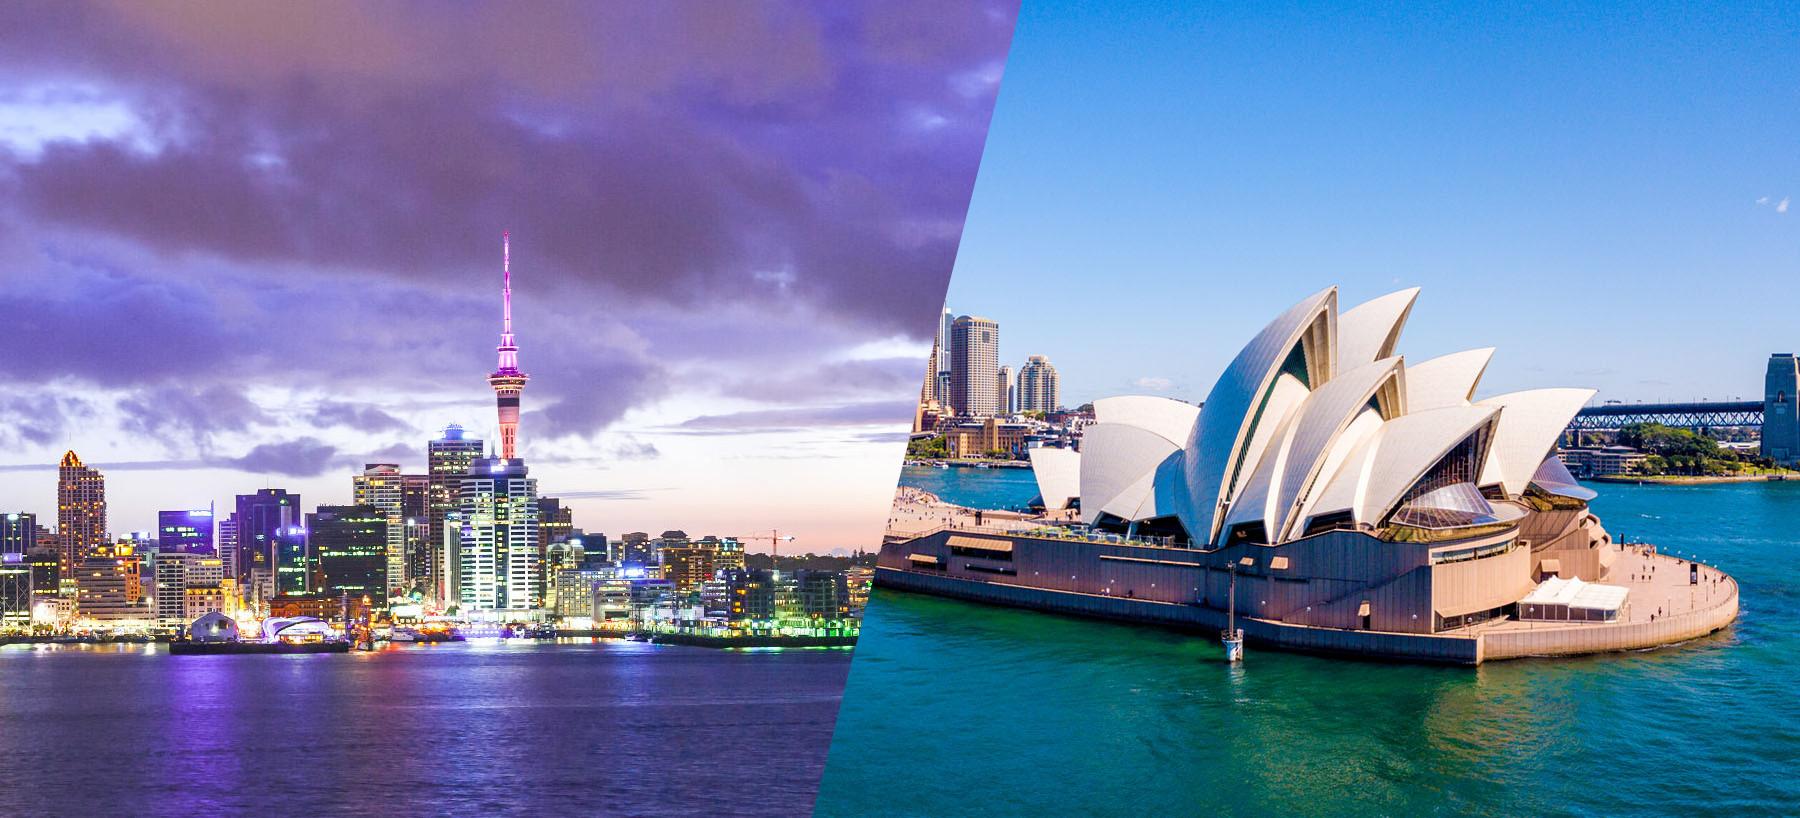 Australia and New Zealand views